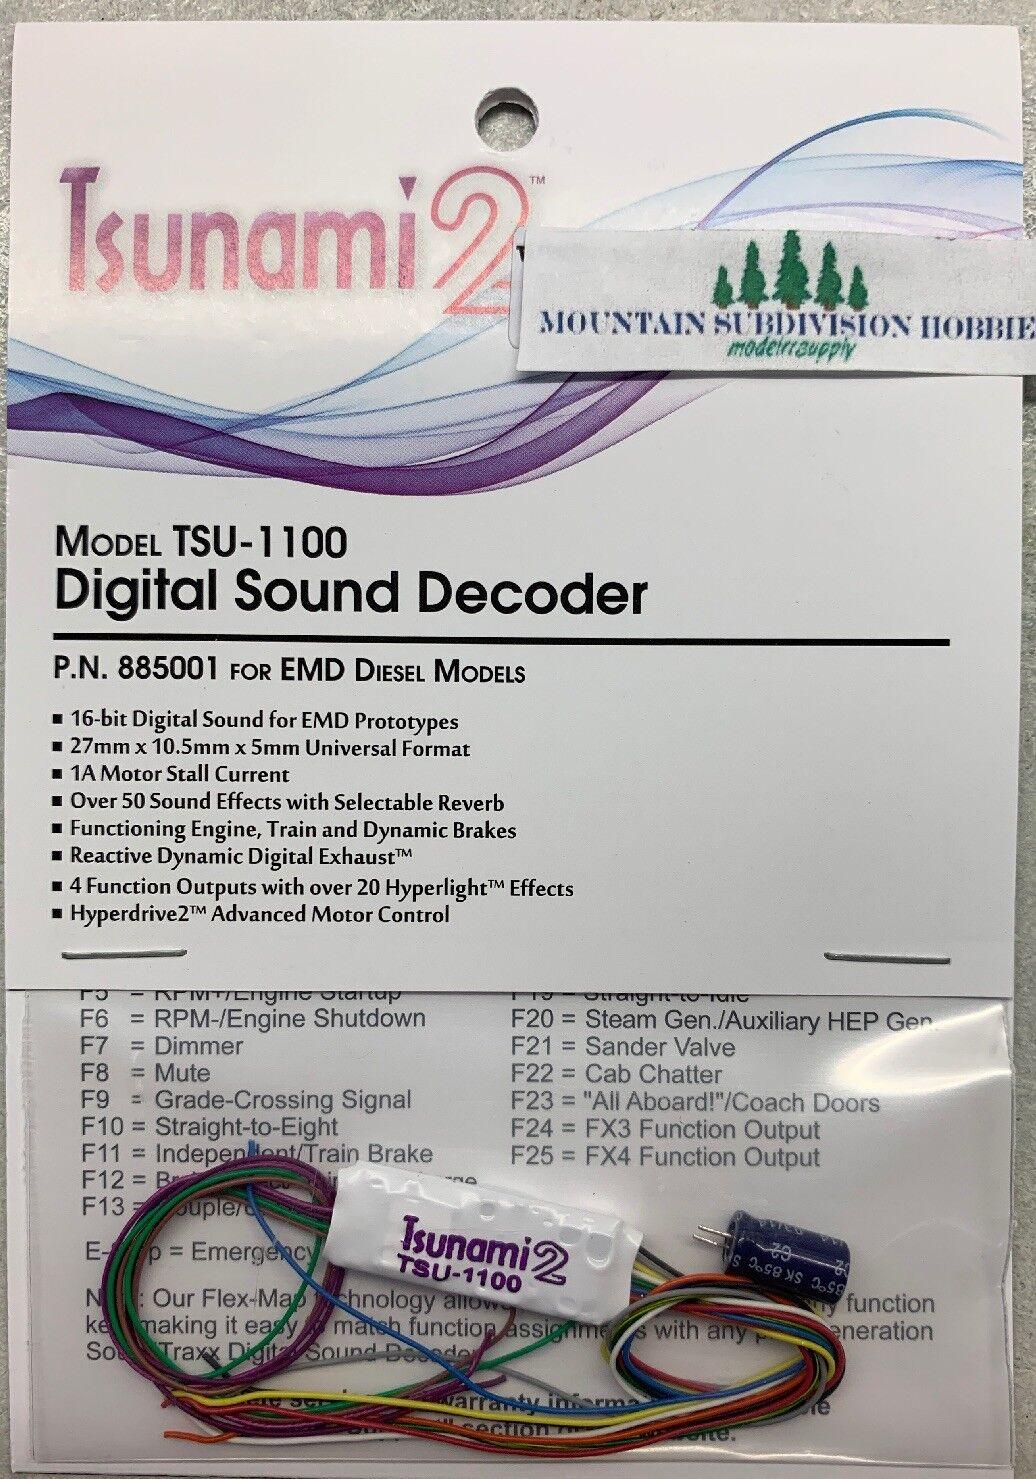 comprar mejor Soundtraxx Tsunami 885001 885001 885001 2 1 A TSU-1100 versión 1.2 EMD modelrrsupply Decodificador de sonido  Precio por piso